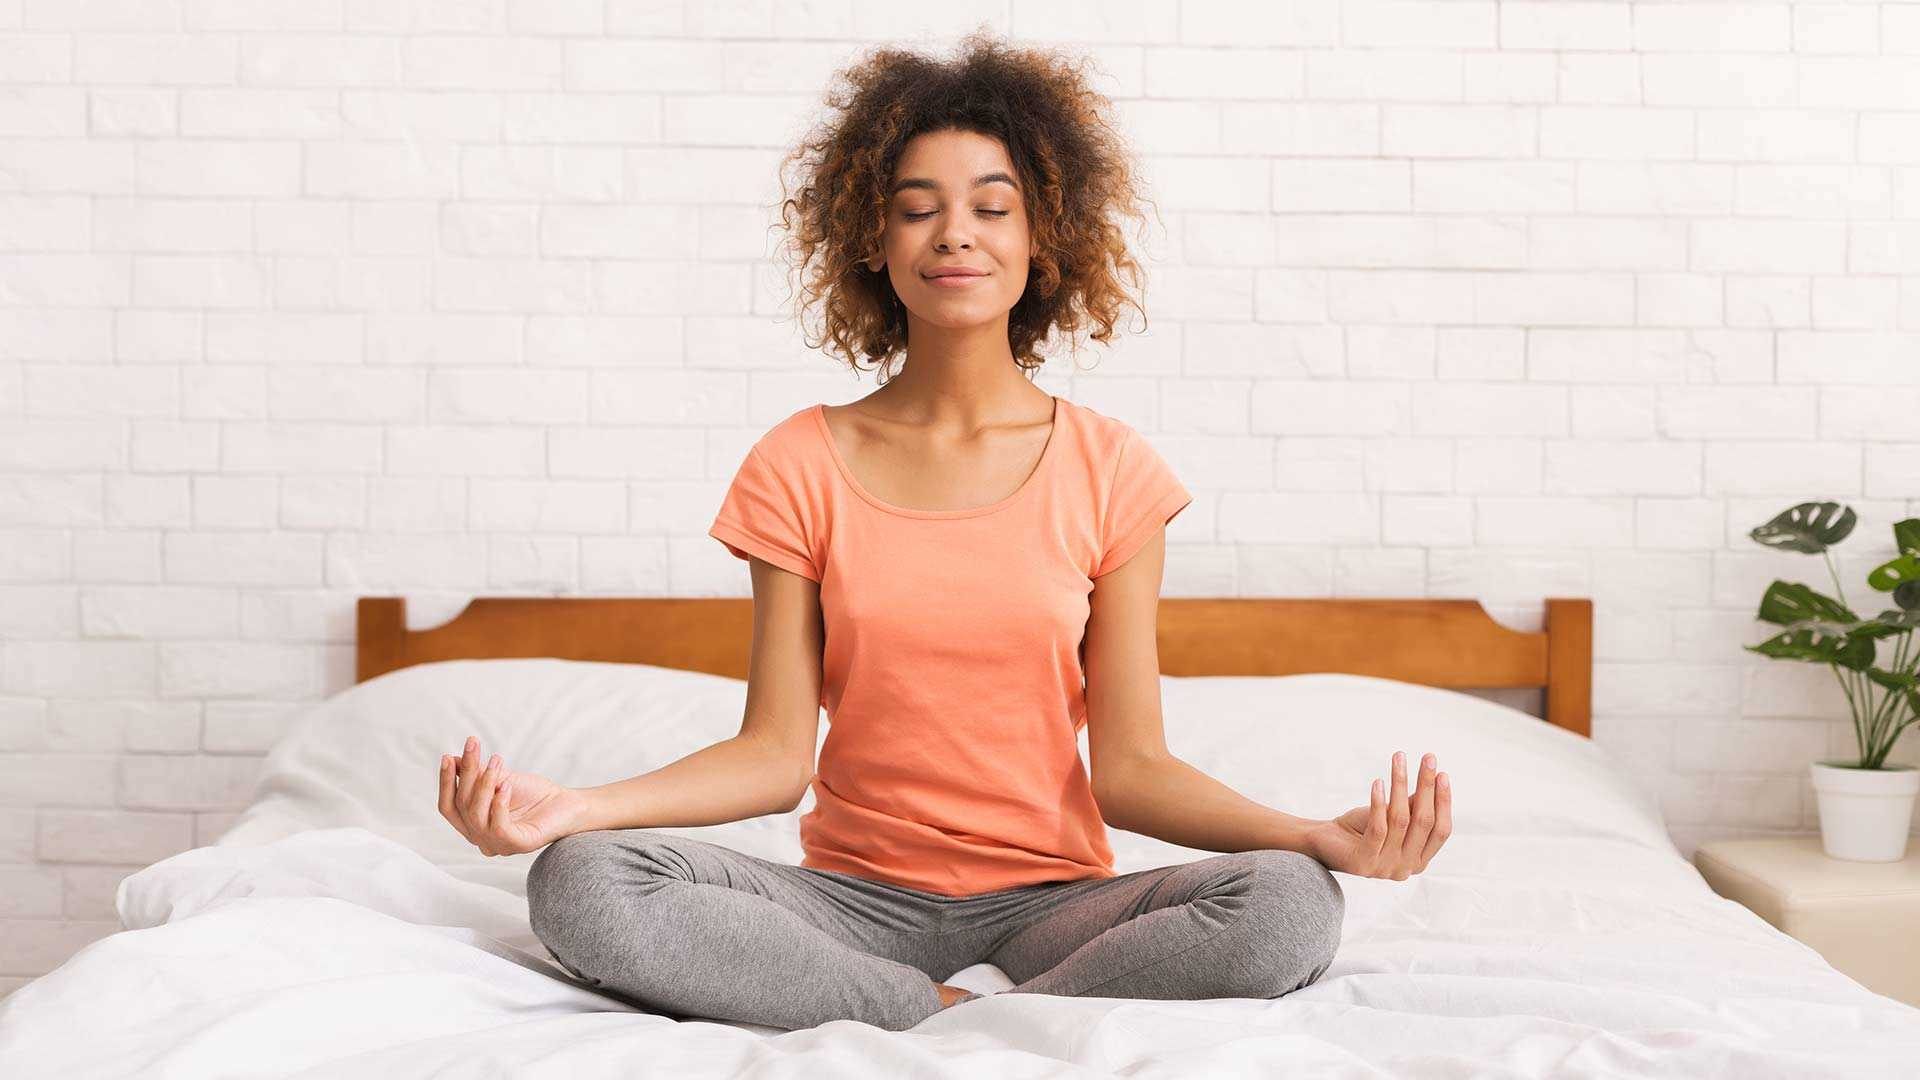 Meditation before bedtime